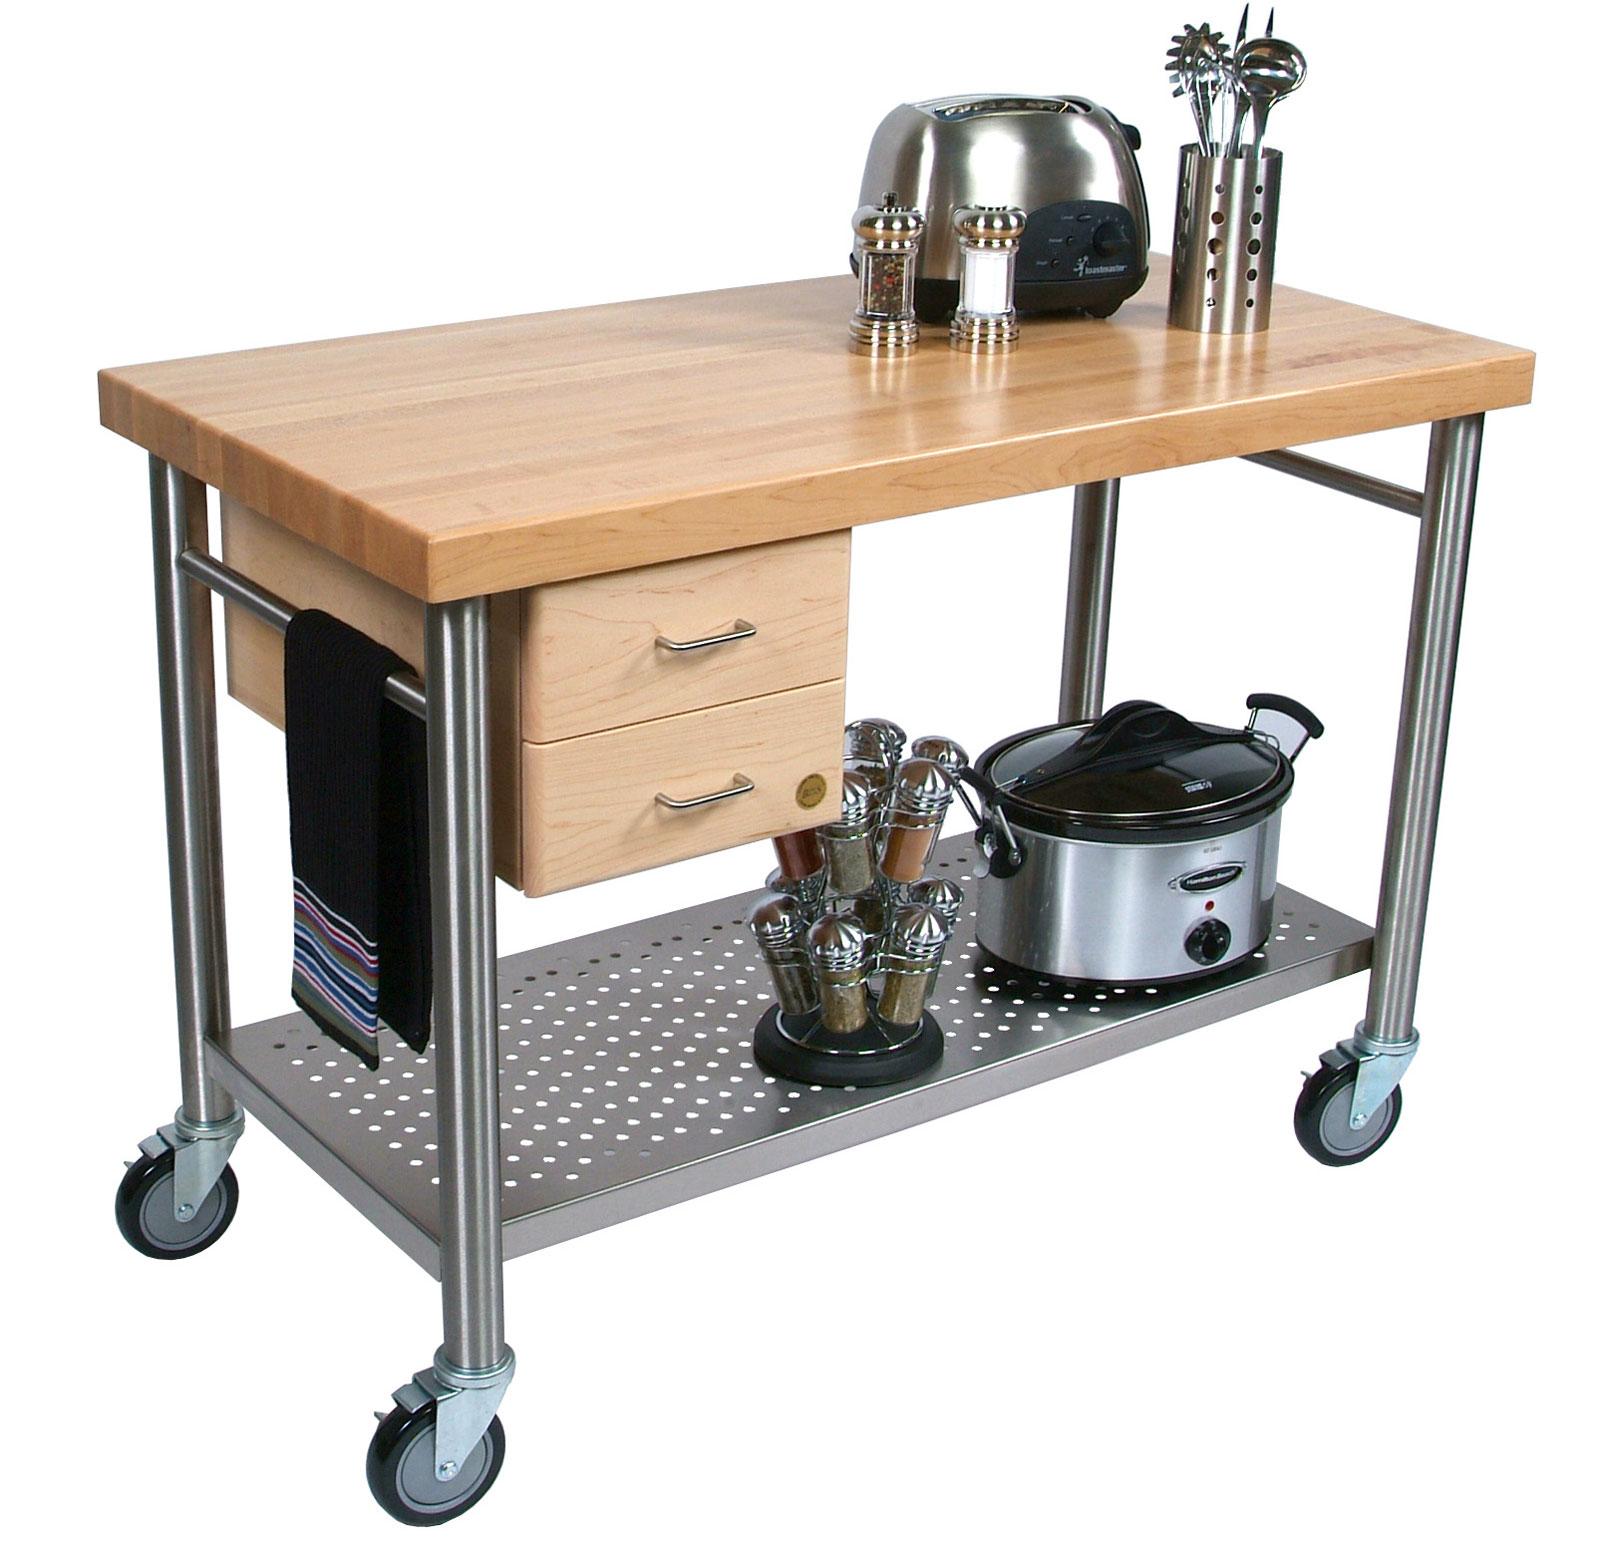 Butcher Block Kitchen Island · Cucina Magnifico Kitchen Island By John Boos    CUCIC04 ...  Kitchen Utility Cart